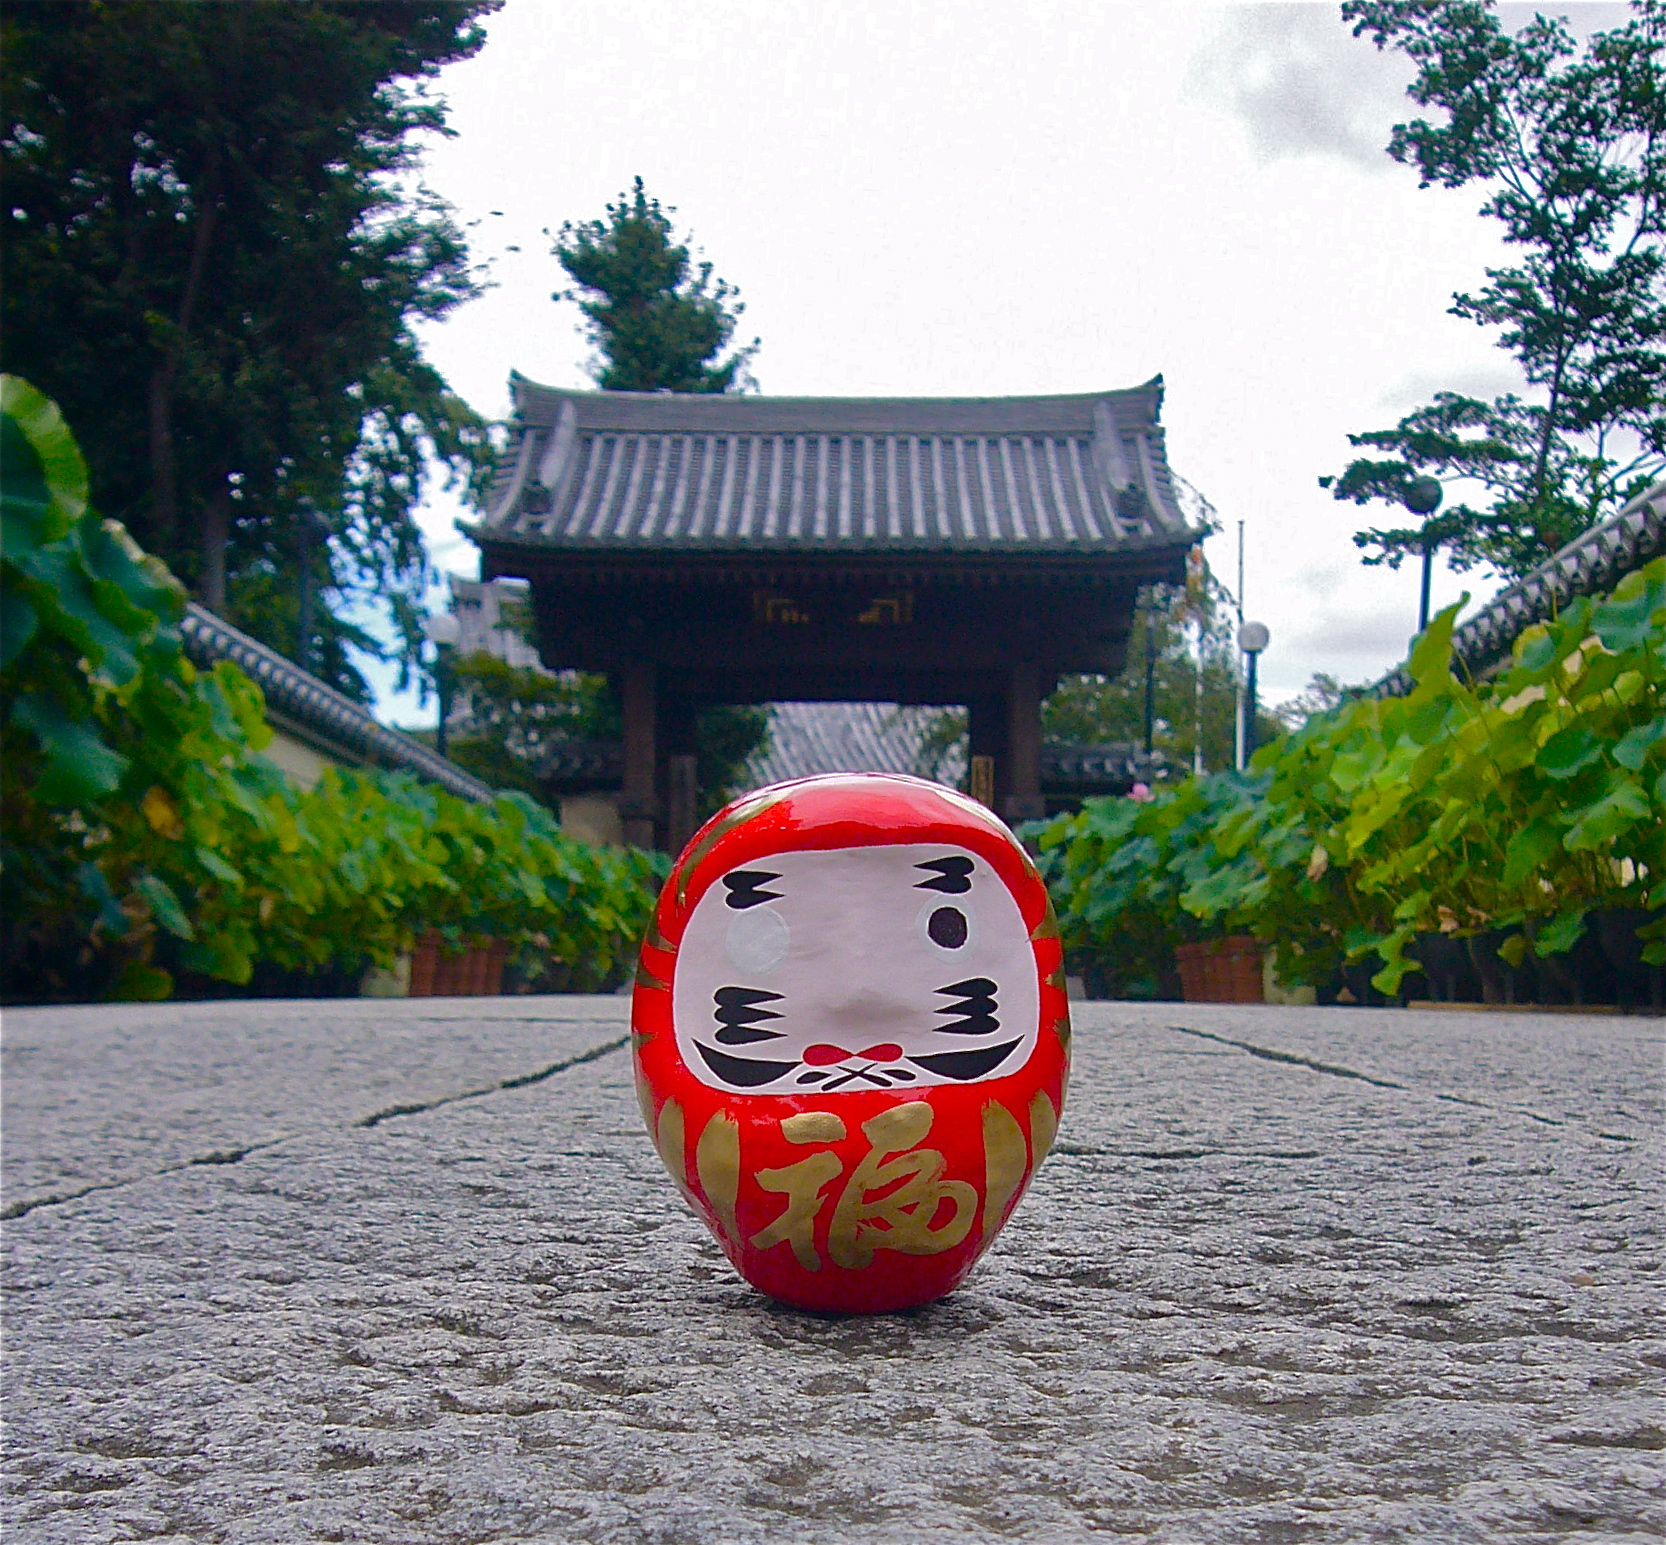 Daruma figure in front of temple gate